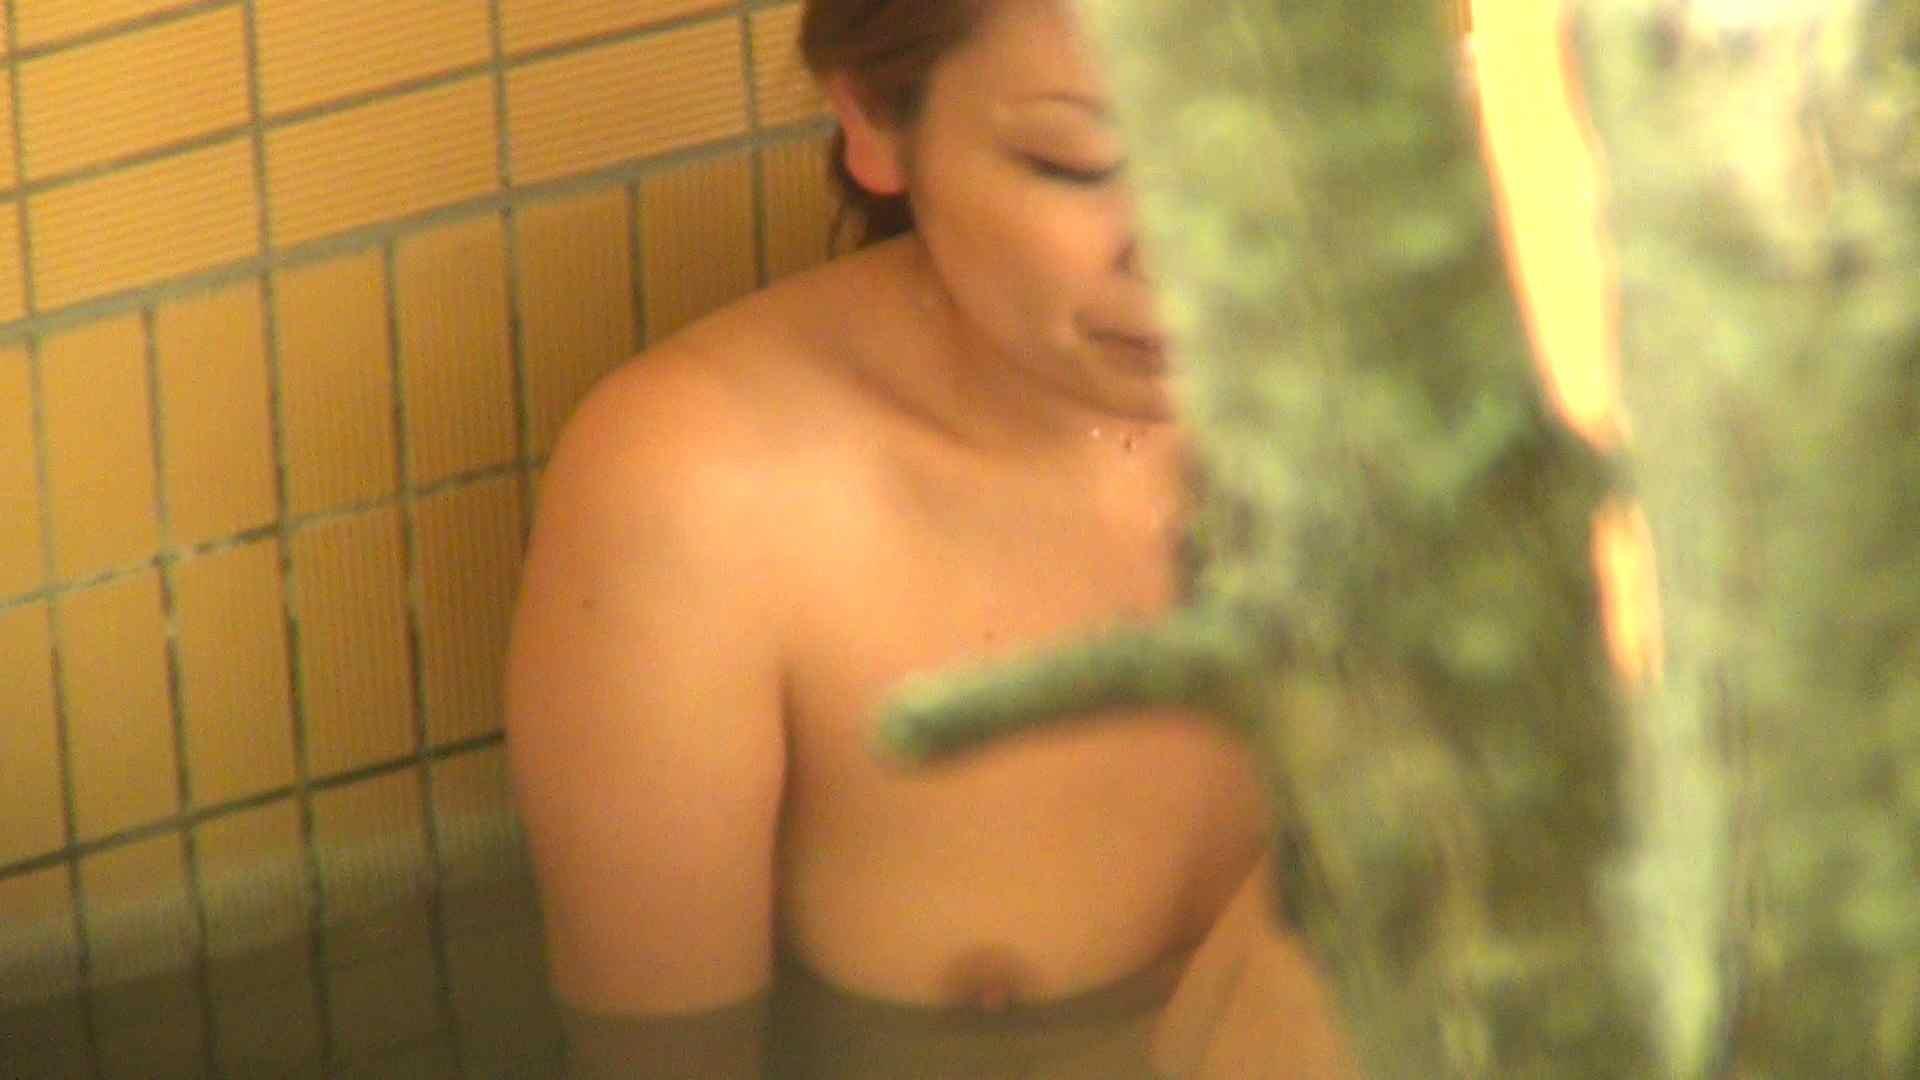 Aquaな露天風呂Vol.295 0  85連発 46